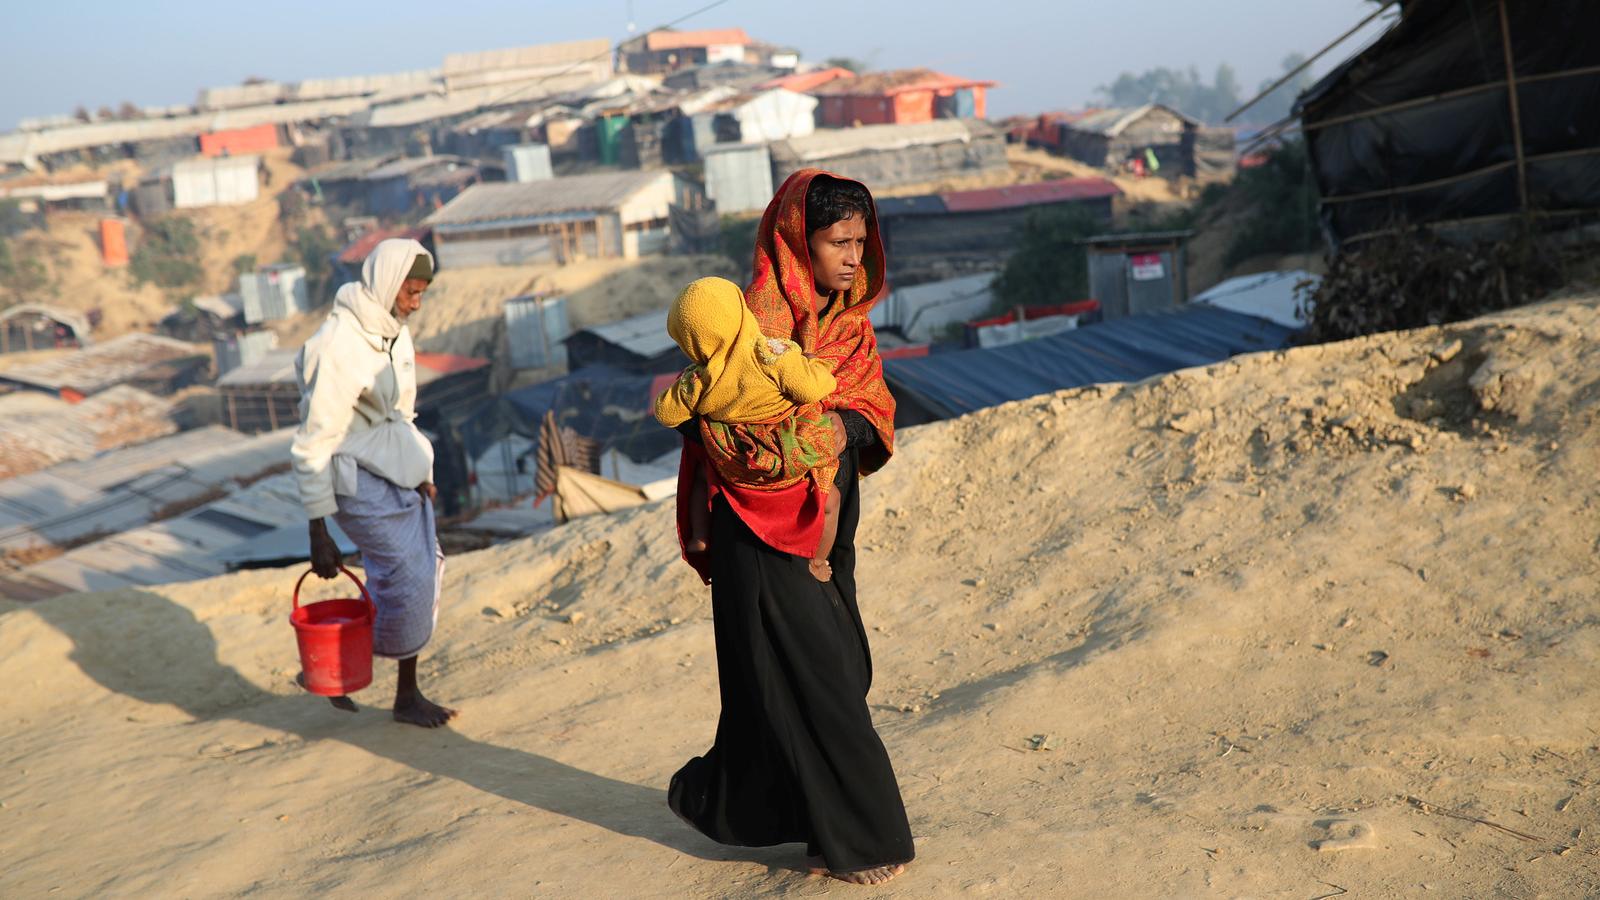 Rohingya refugees walk at Jamtoli camp in the morning in Cox's Bazar, Bangladesh, Jan. 22, 2018.